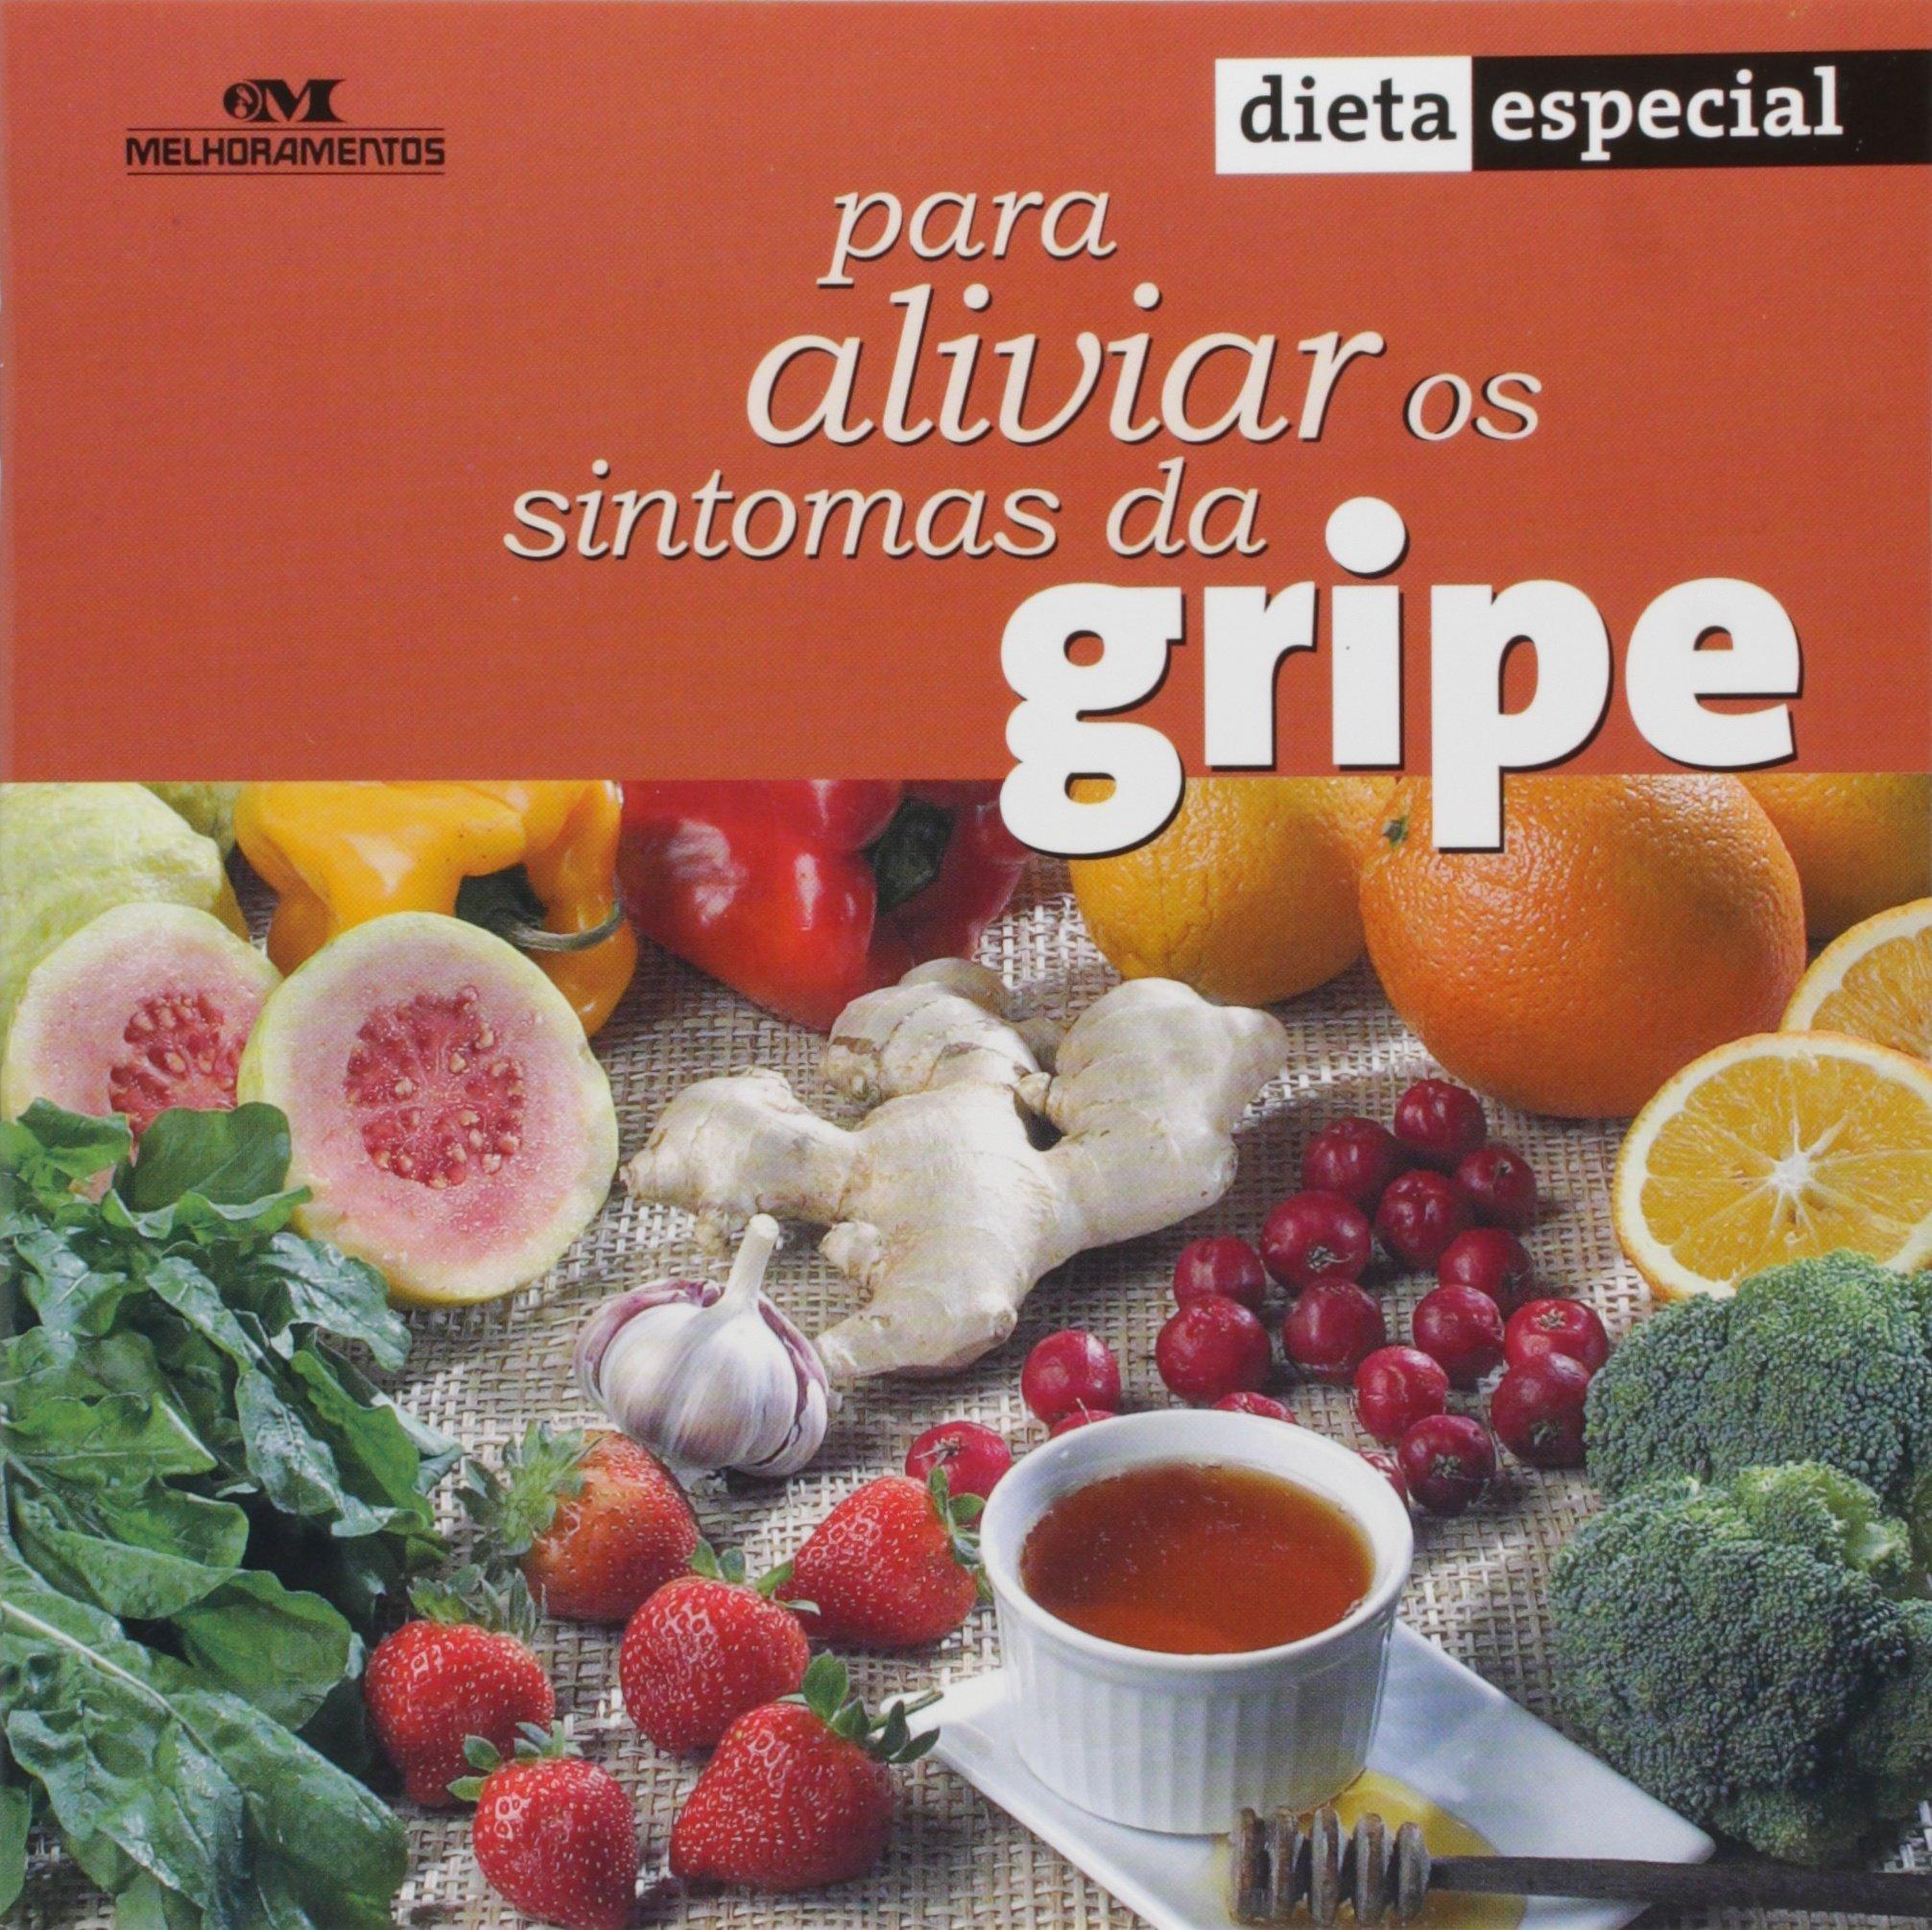 Dieta Especial Para Aliviar Os Sintomas Da Gripe Em Portuguese do Brasil: Amazon.es: Silvana Salermo: Libros